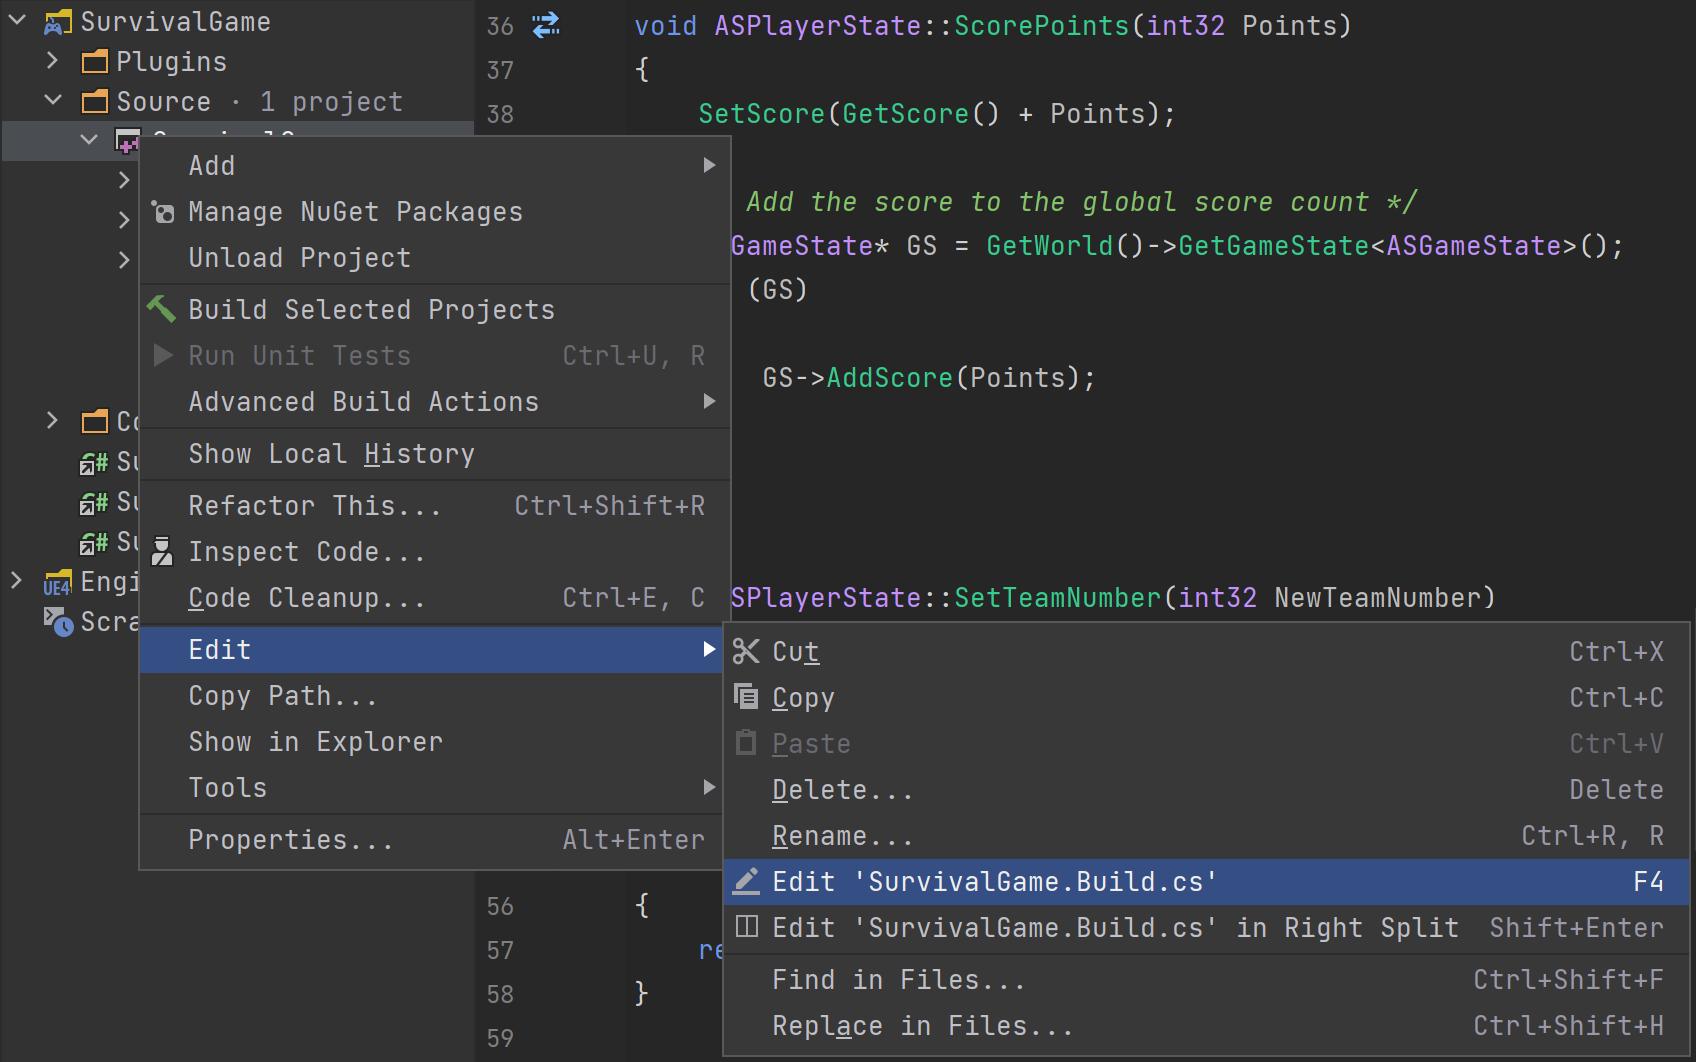 Edit Build.cs